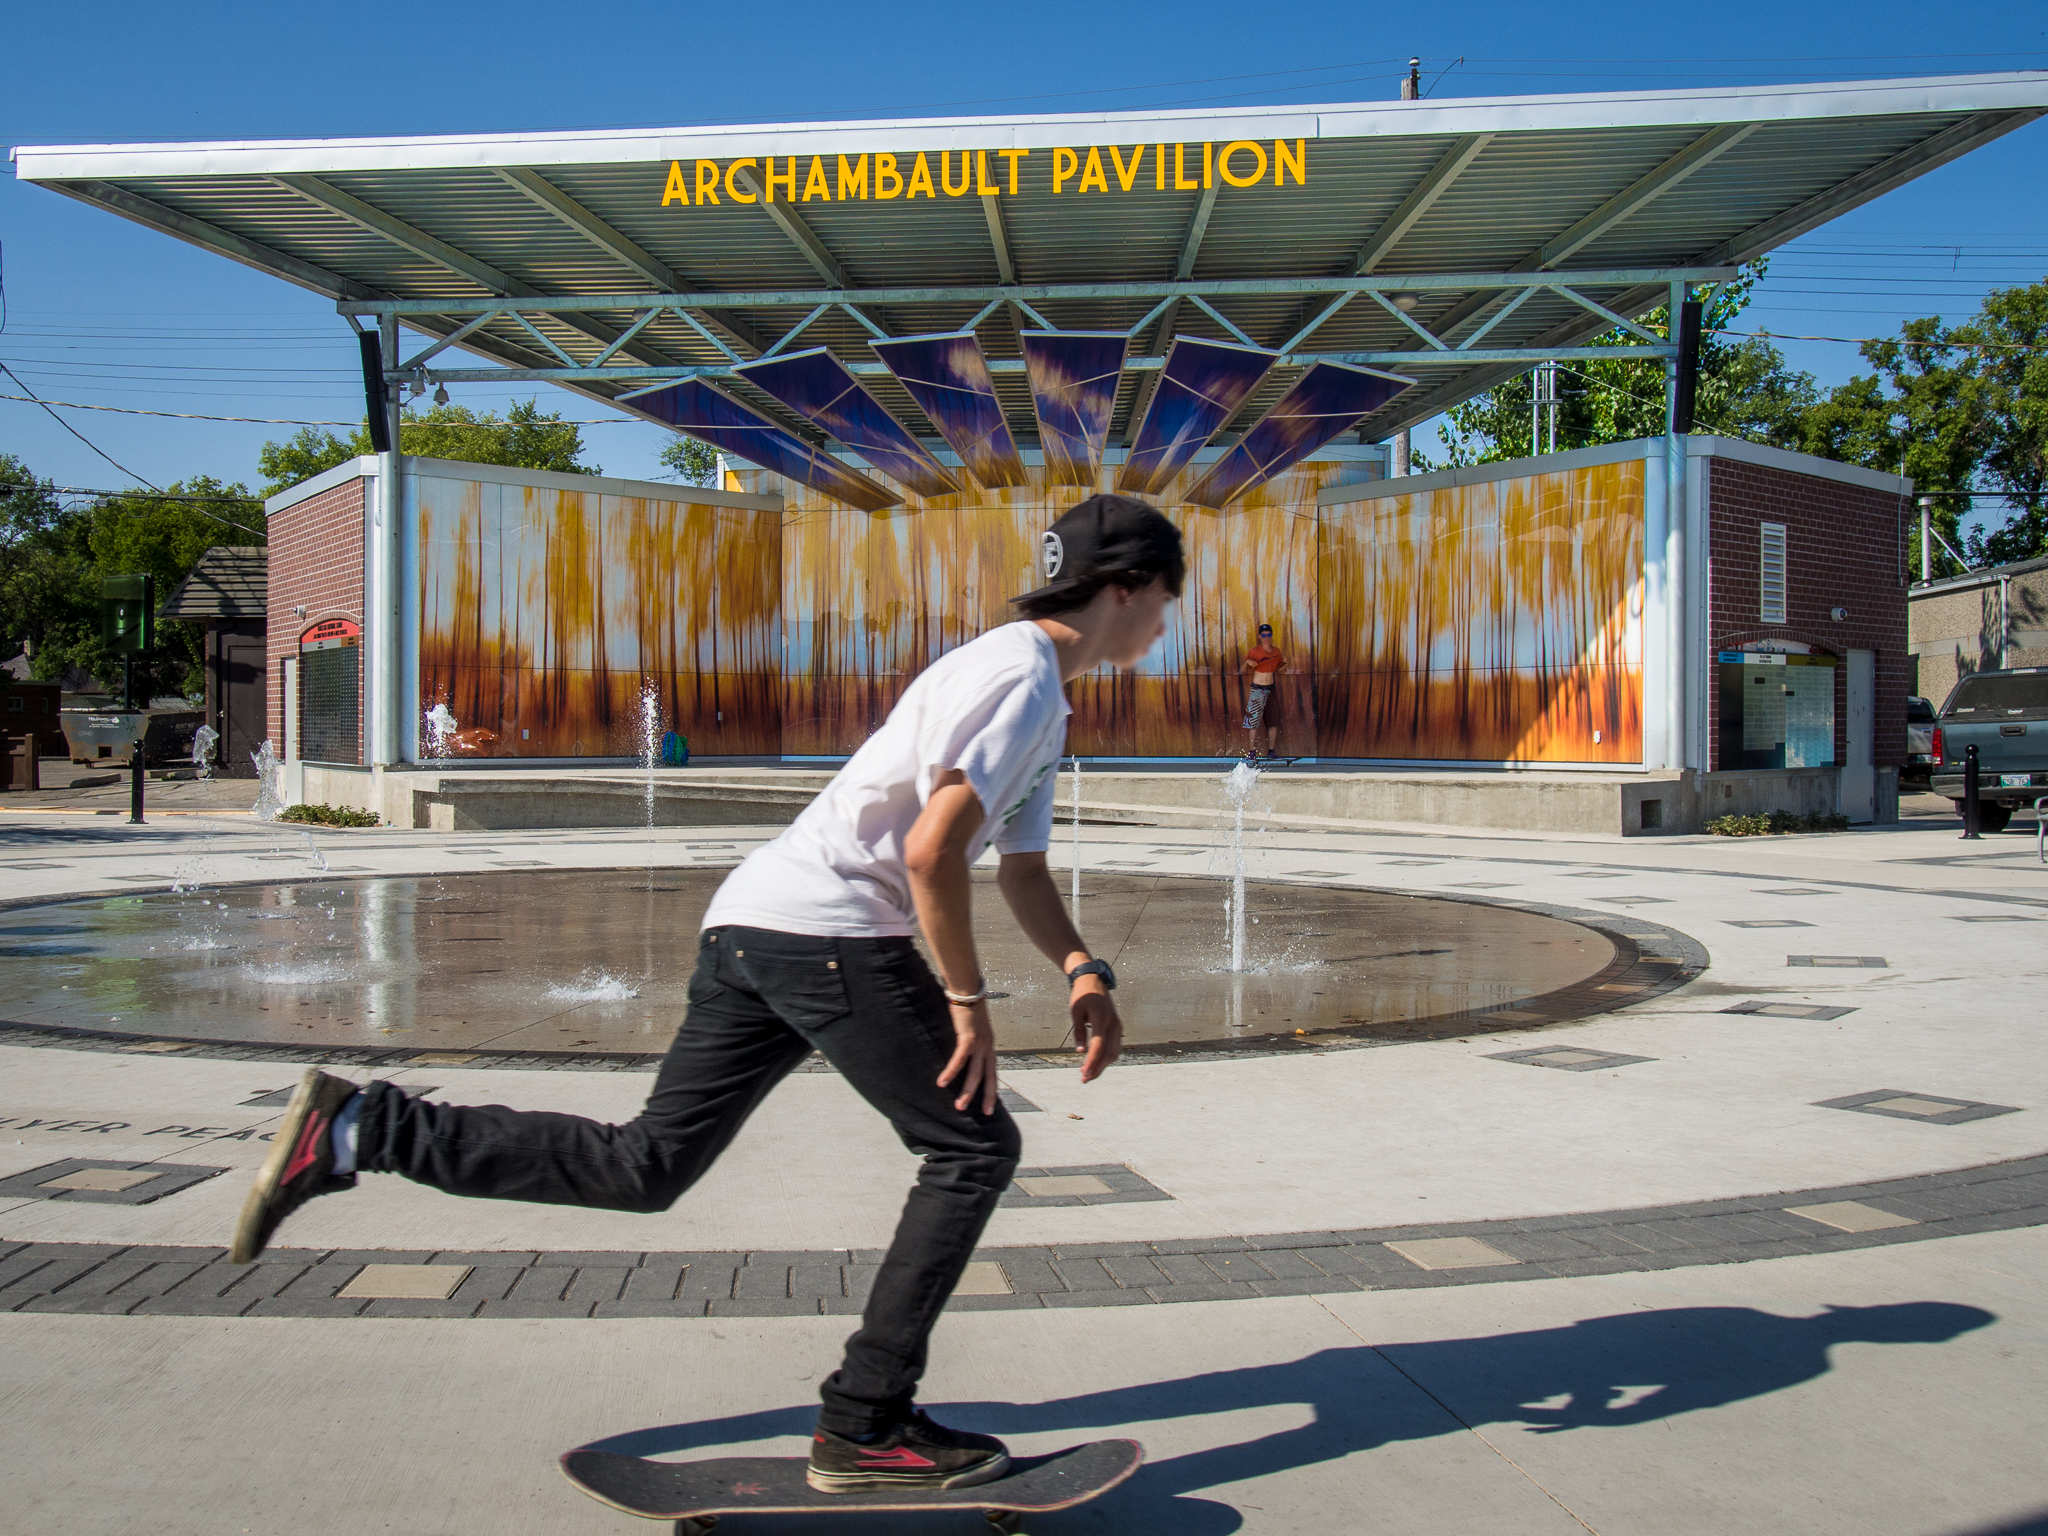 Archambault Pavilion